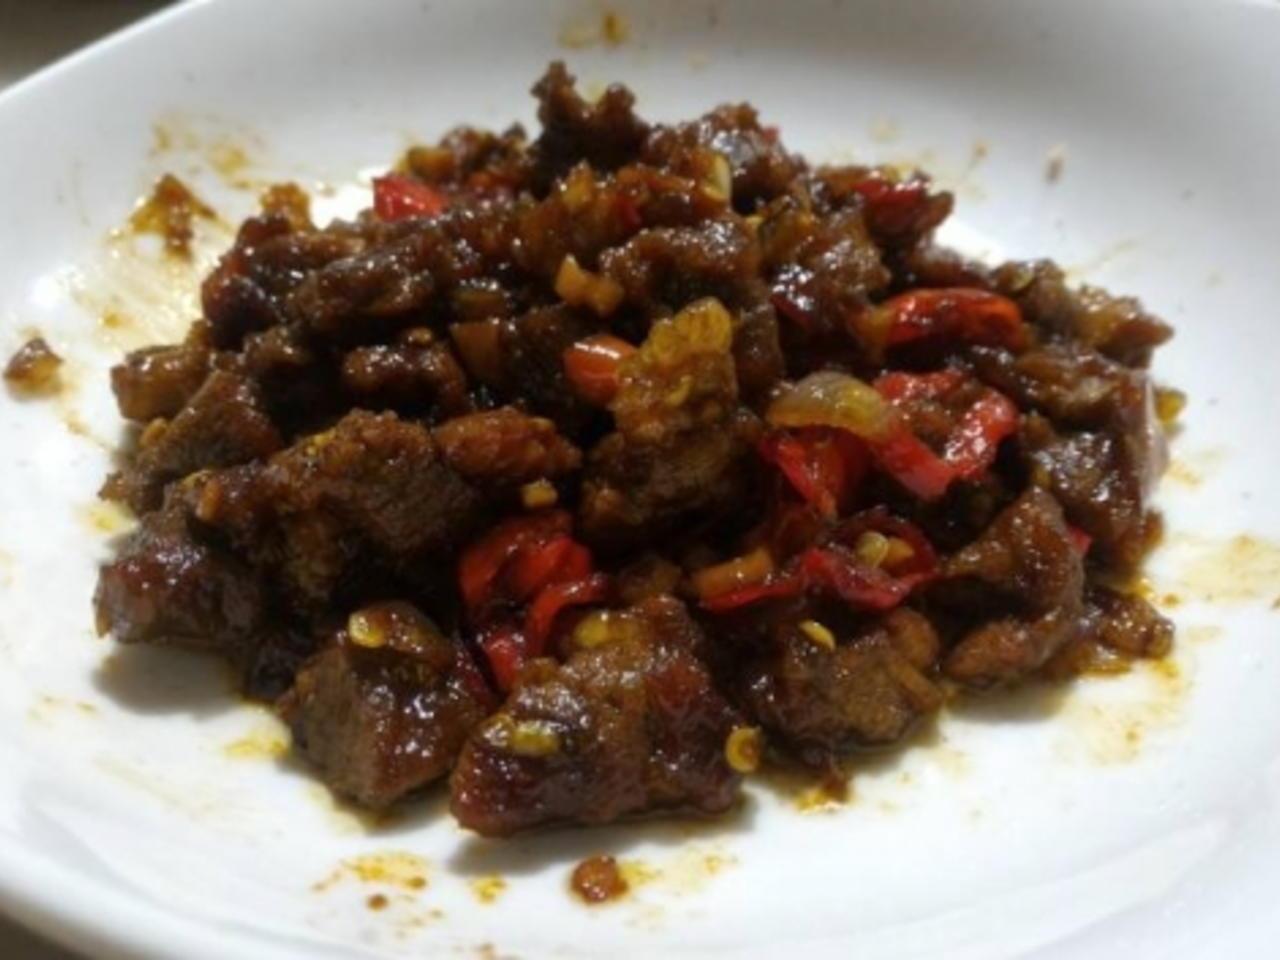 5 Makanan Lezat Khas Yogyakarta (Selain Gudeg) 6